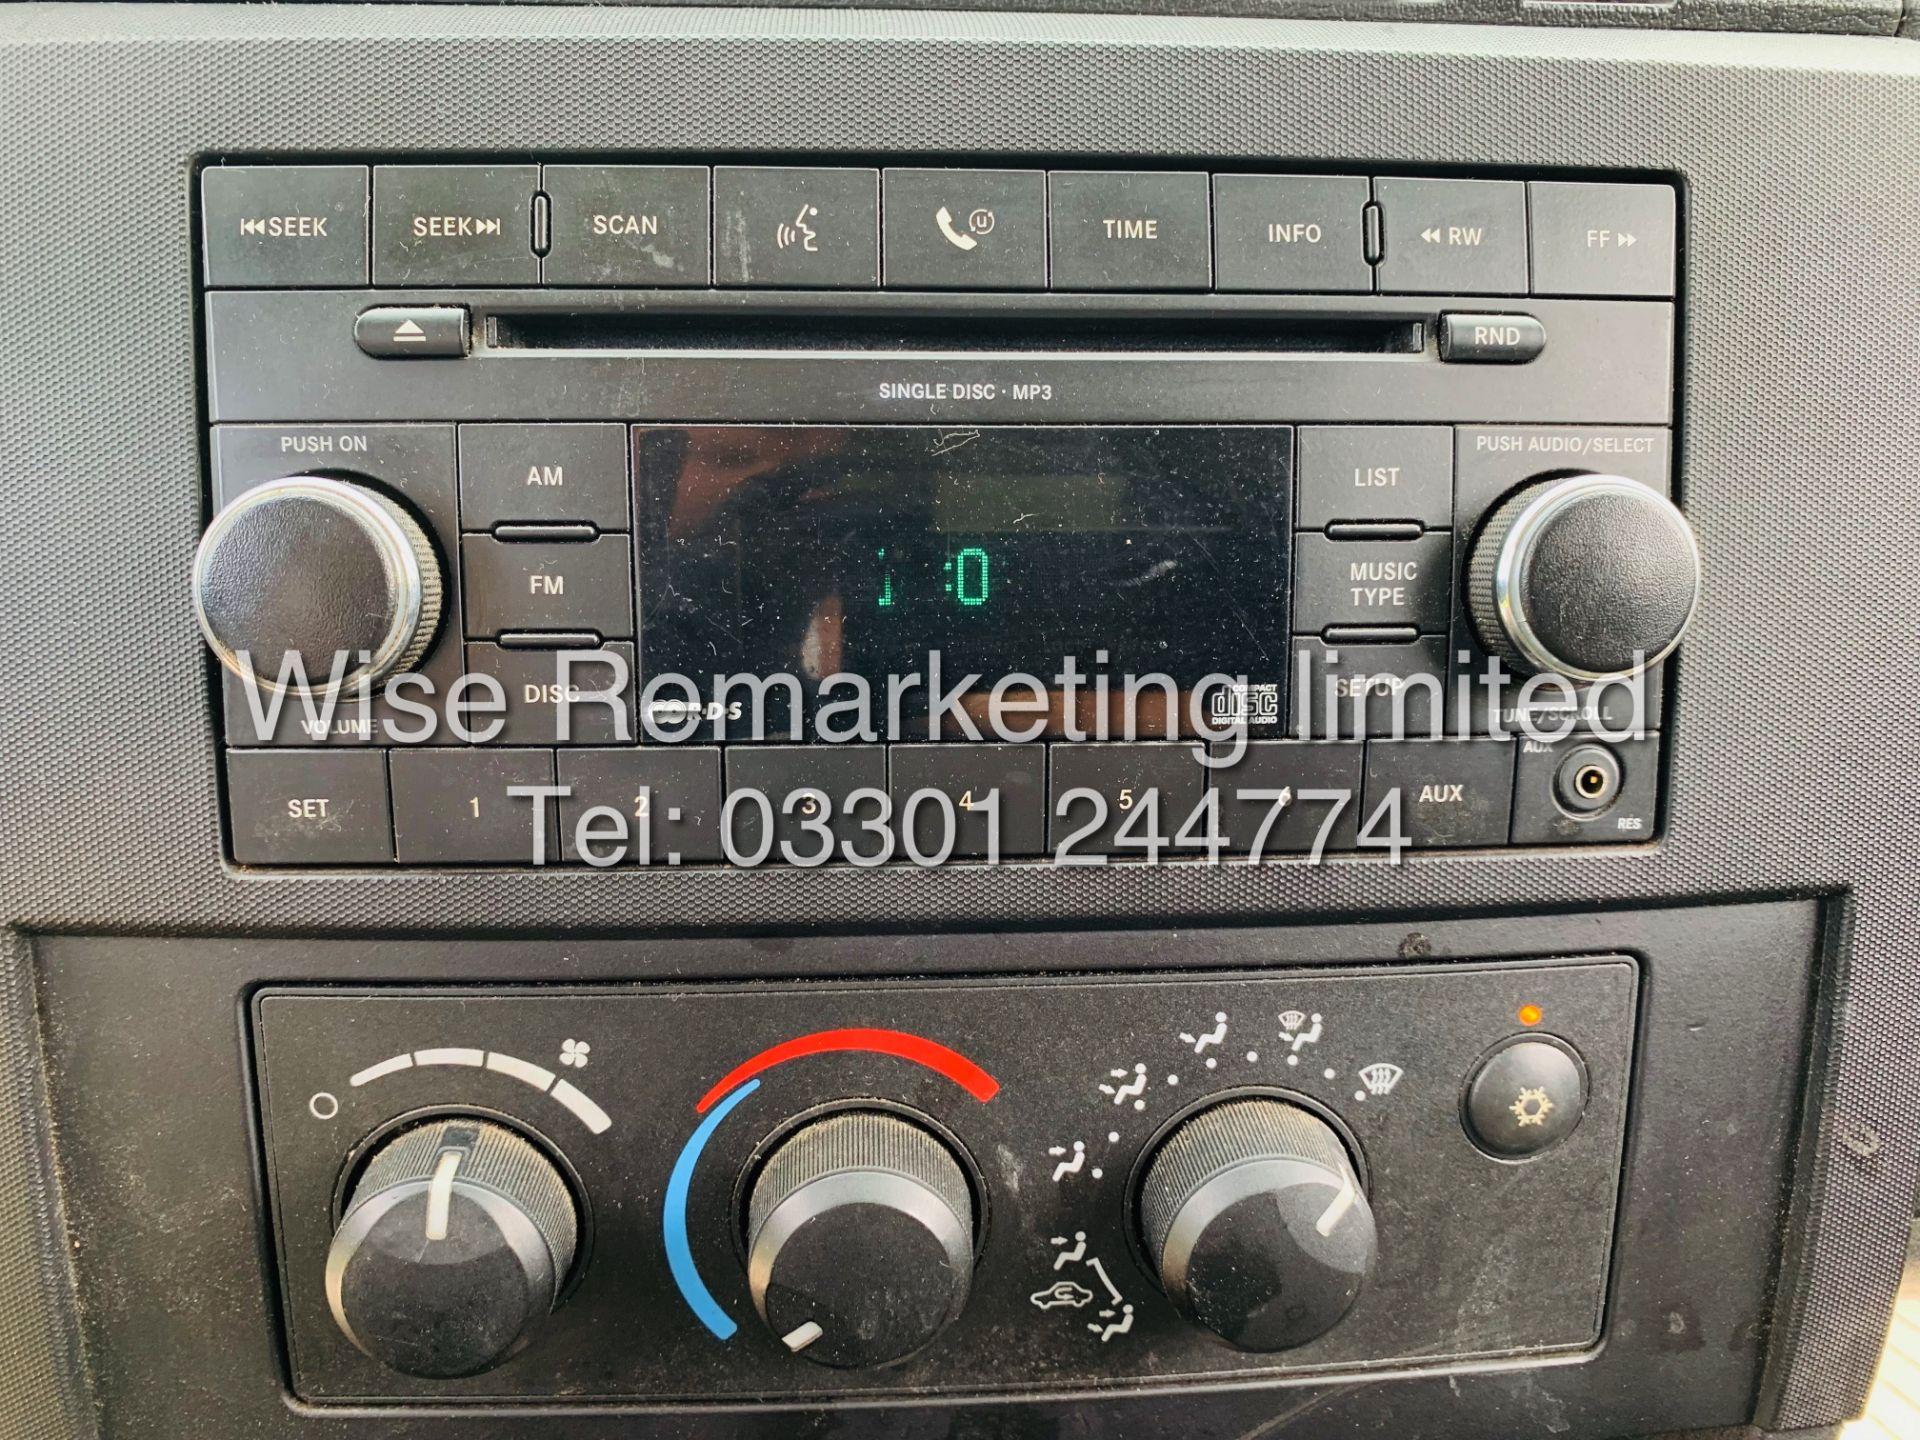 Lot 10 - DODGE DAKOTA 3.5L V6*2008*KING-CAB**FRESH IMPORT**AIR CON**KING-CAB***6 SEATS*REAR COMMERCIAL TOP